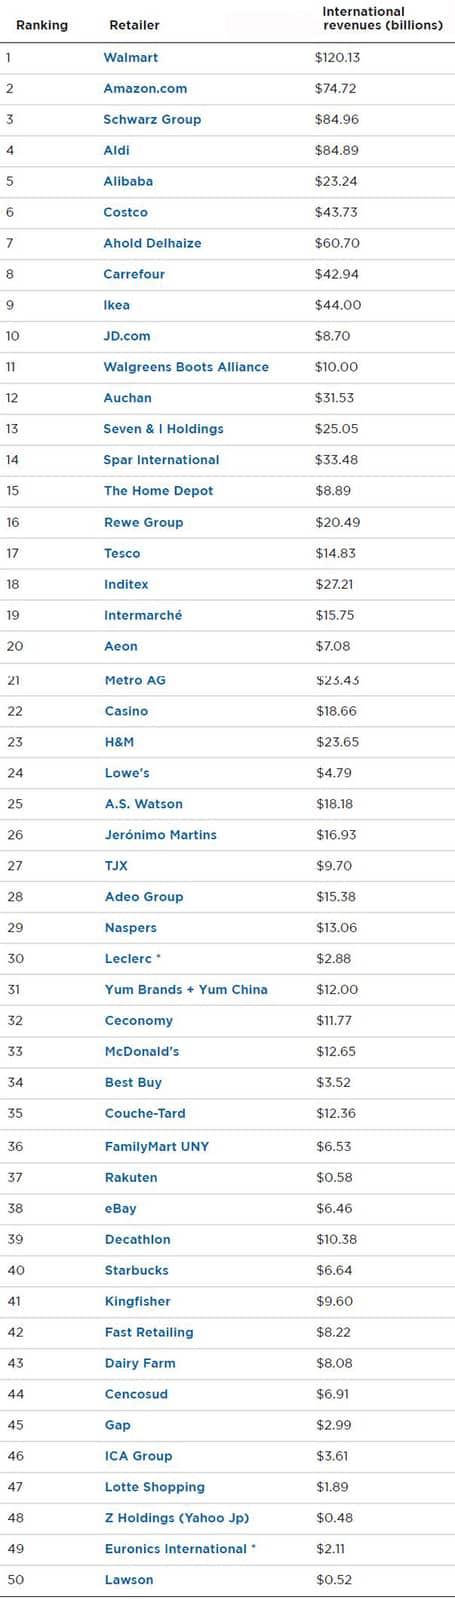 2021 Top 50 Global Retailers